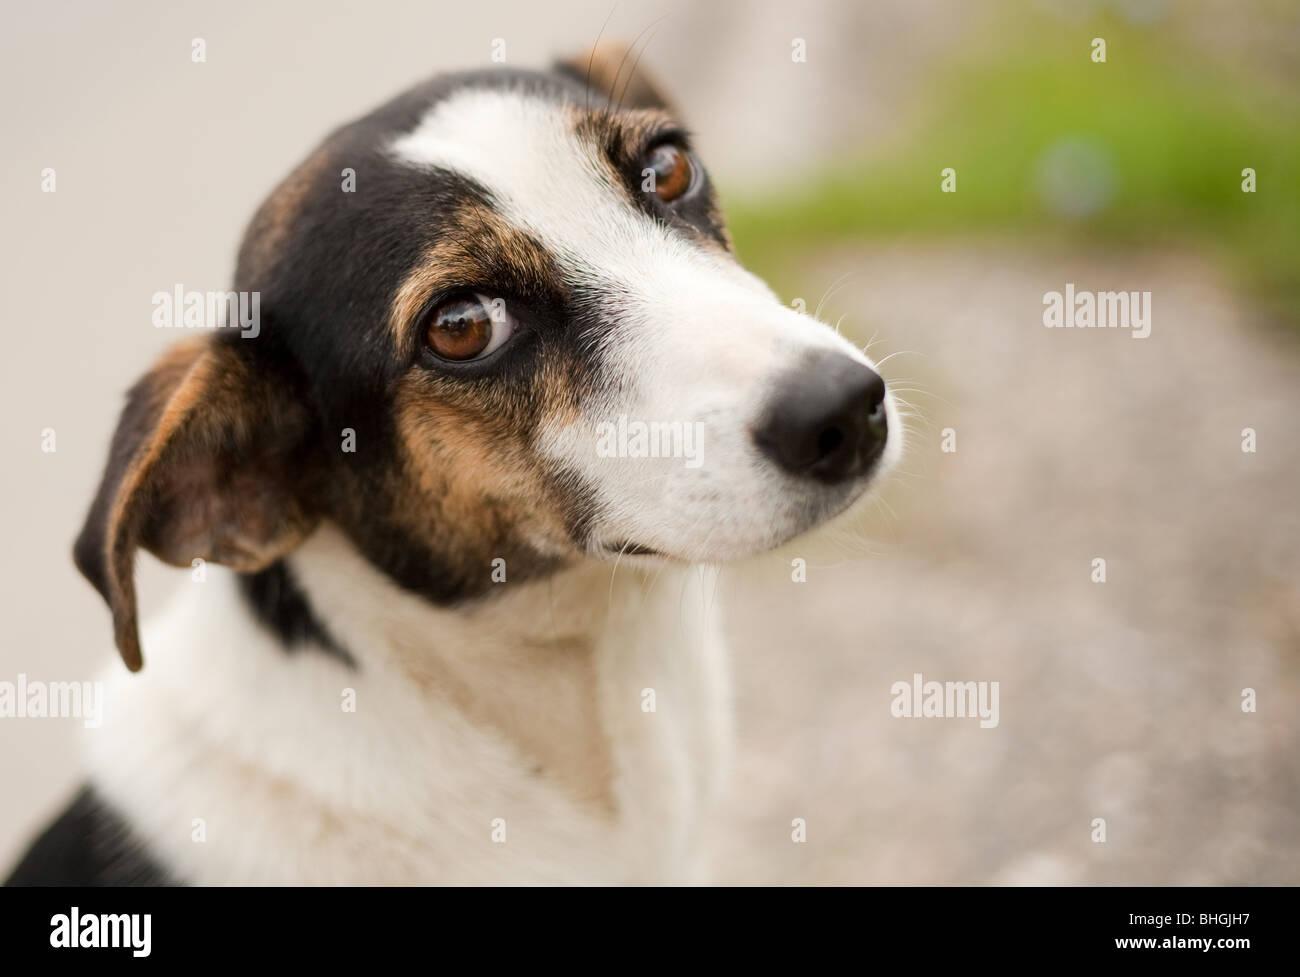 Retrato de un adorable pequeño perro piscina Imagen De Stock